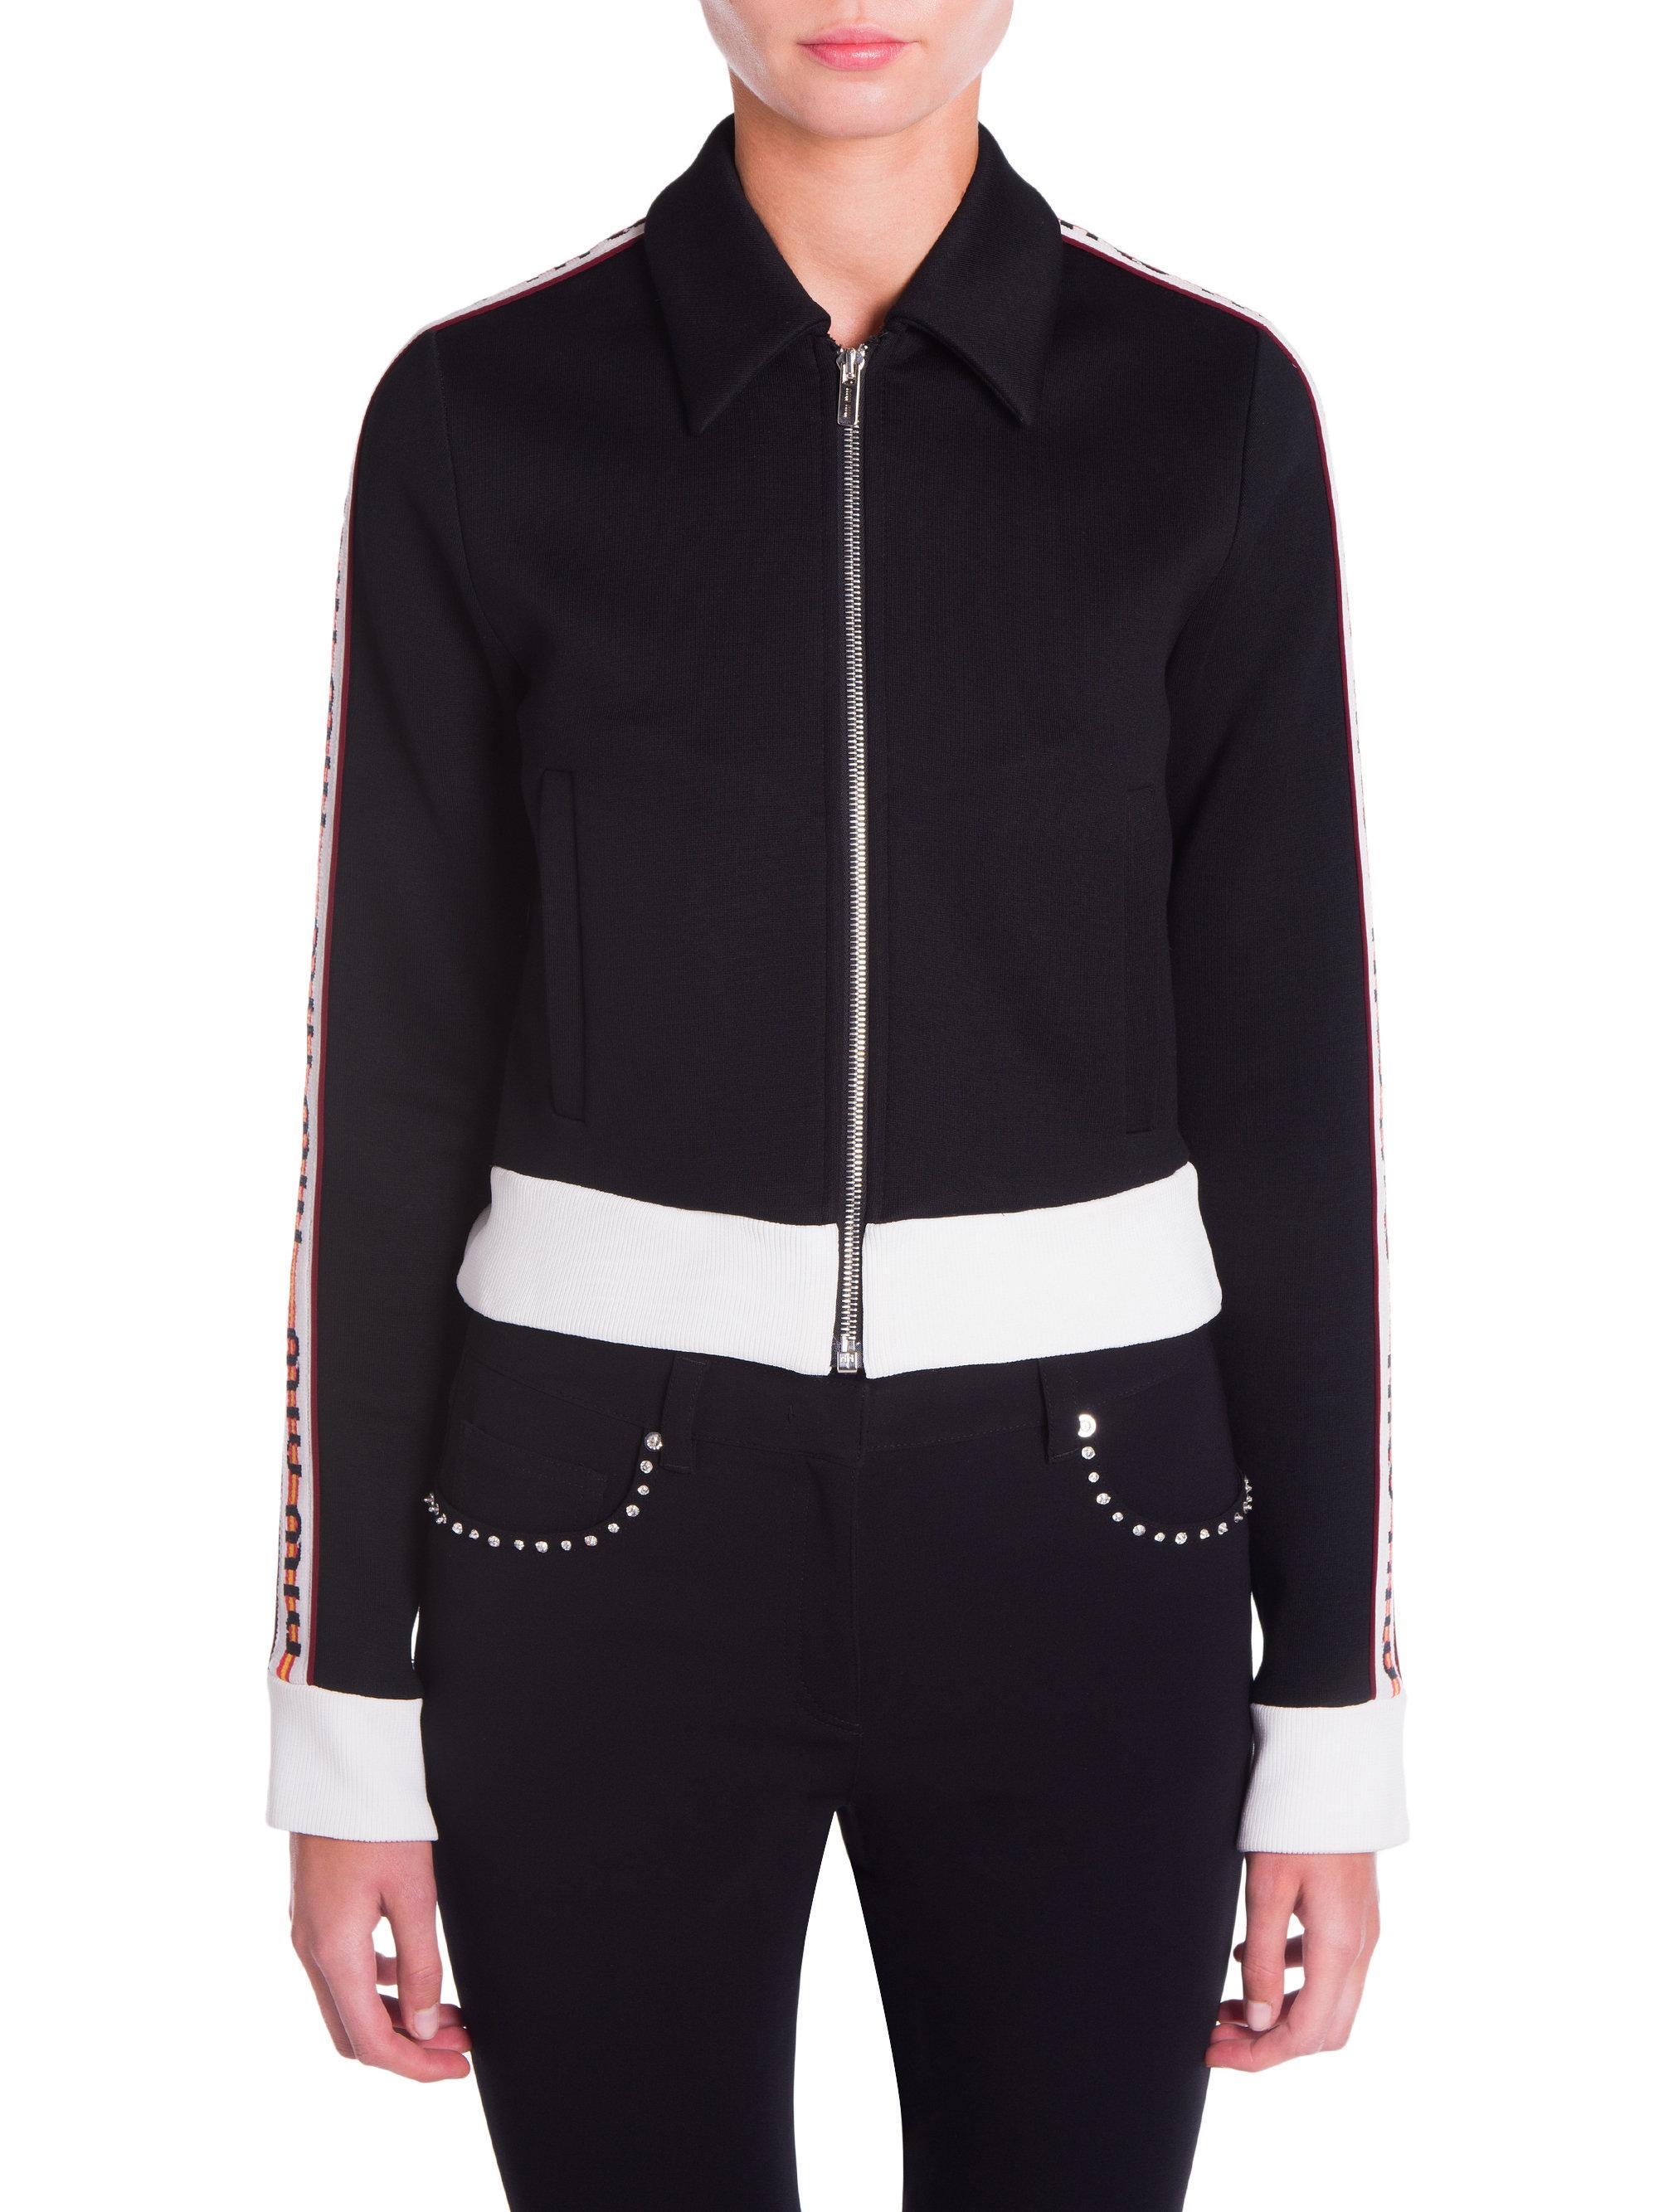 0d6a19fe403f Miu Miu Logo Tracksuit Jersey Jacket in Black - Lyst